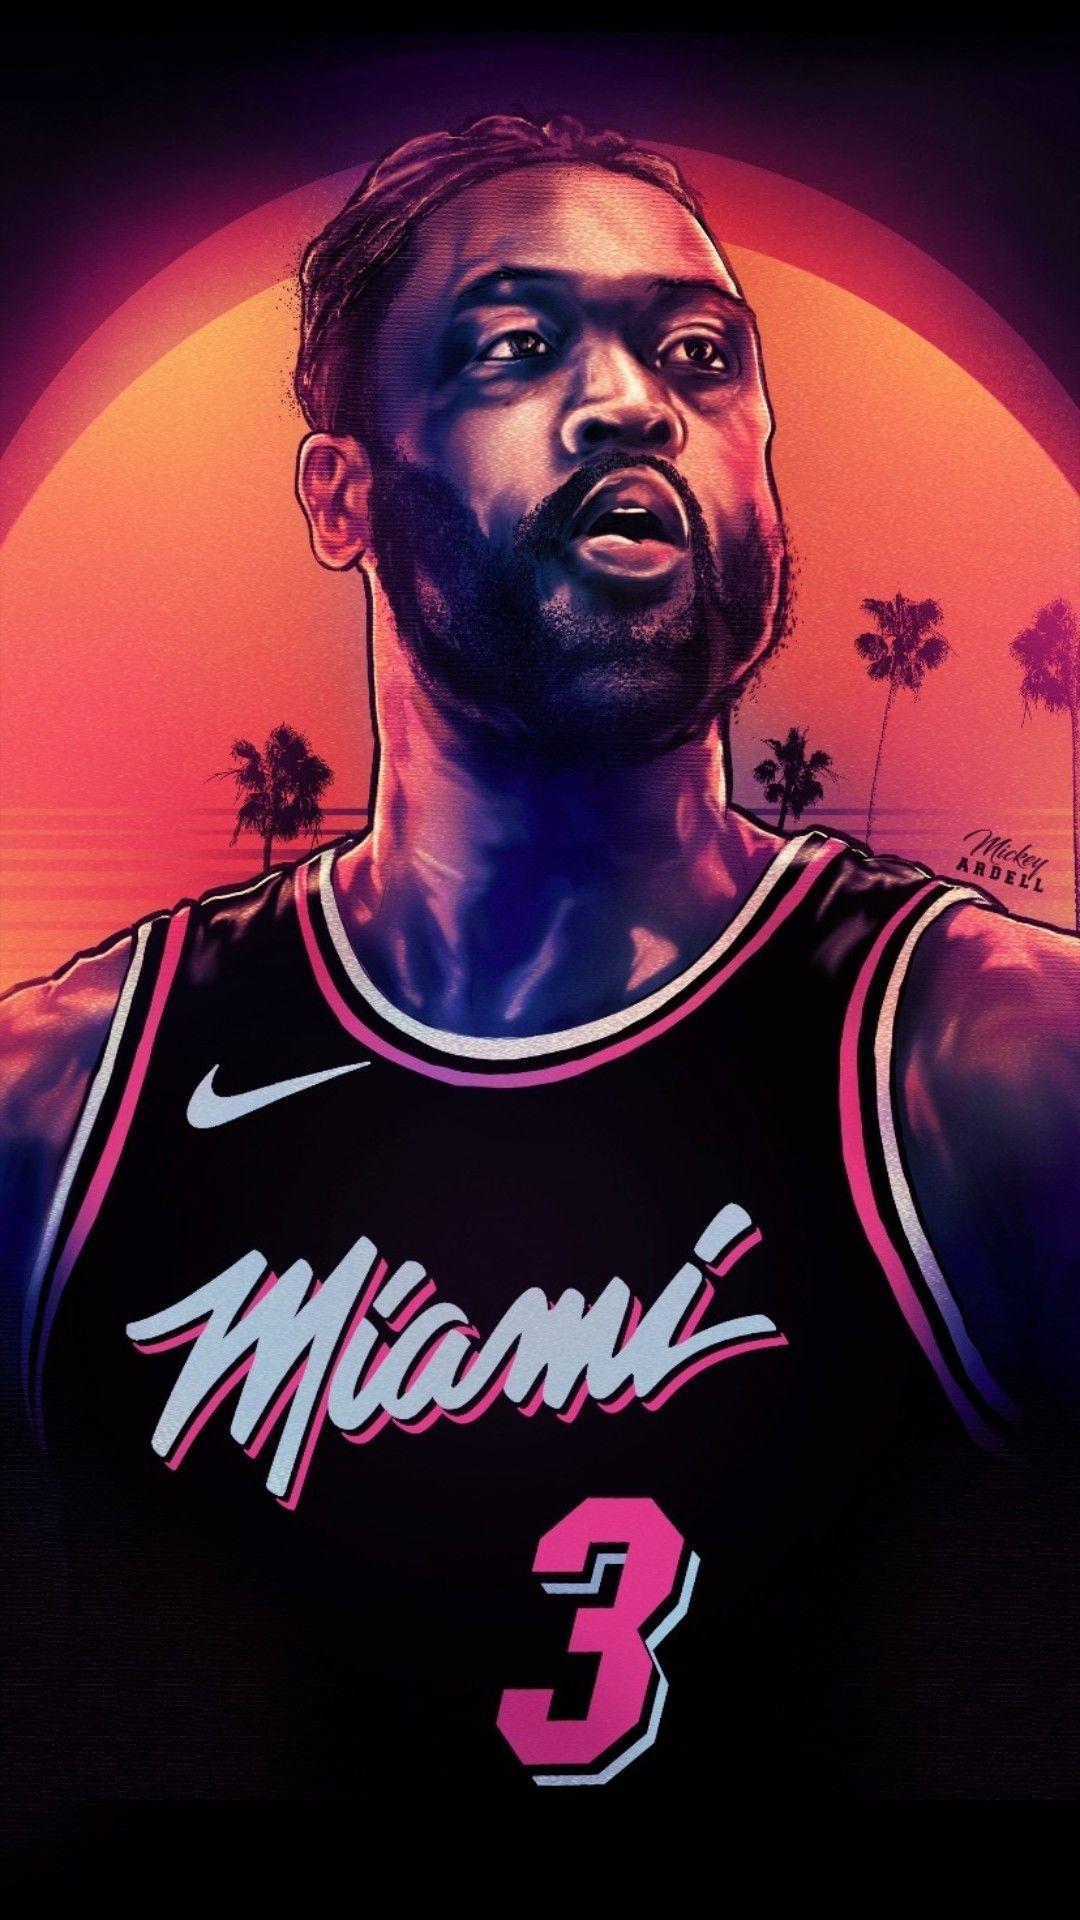 Lebron Miami Heat Wallpaper Lebron Miami In 2020 Nba Basketball Art Mvp Basketball Nba Mvp